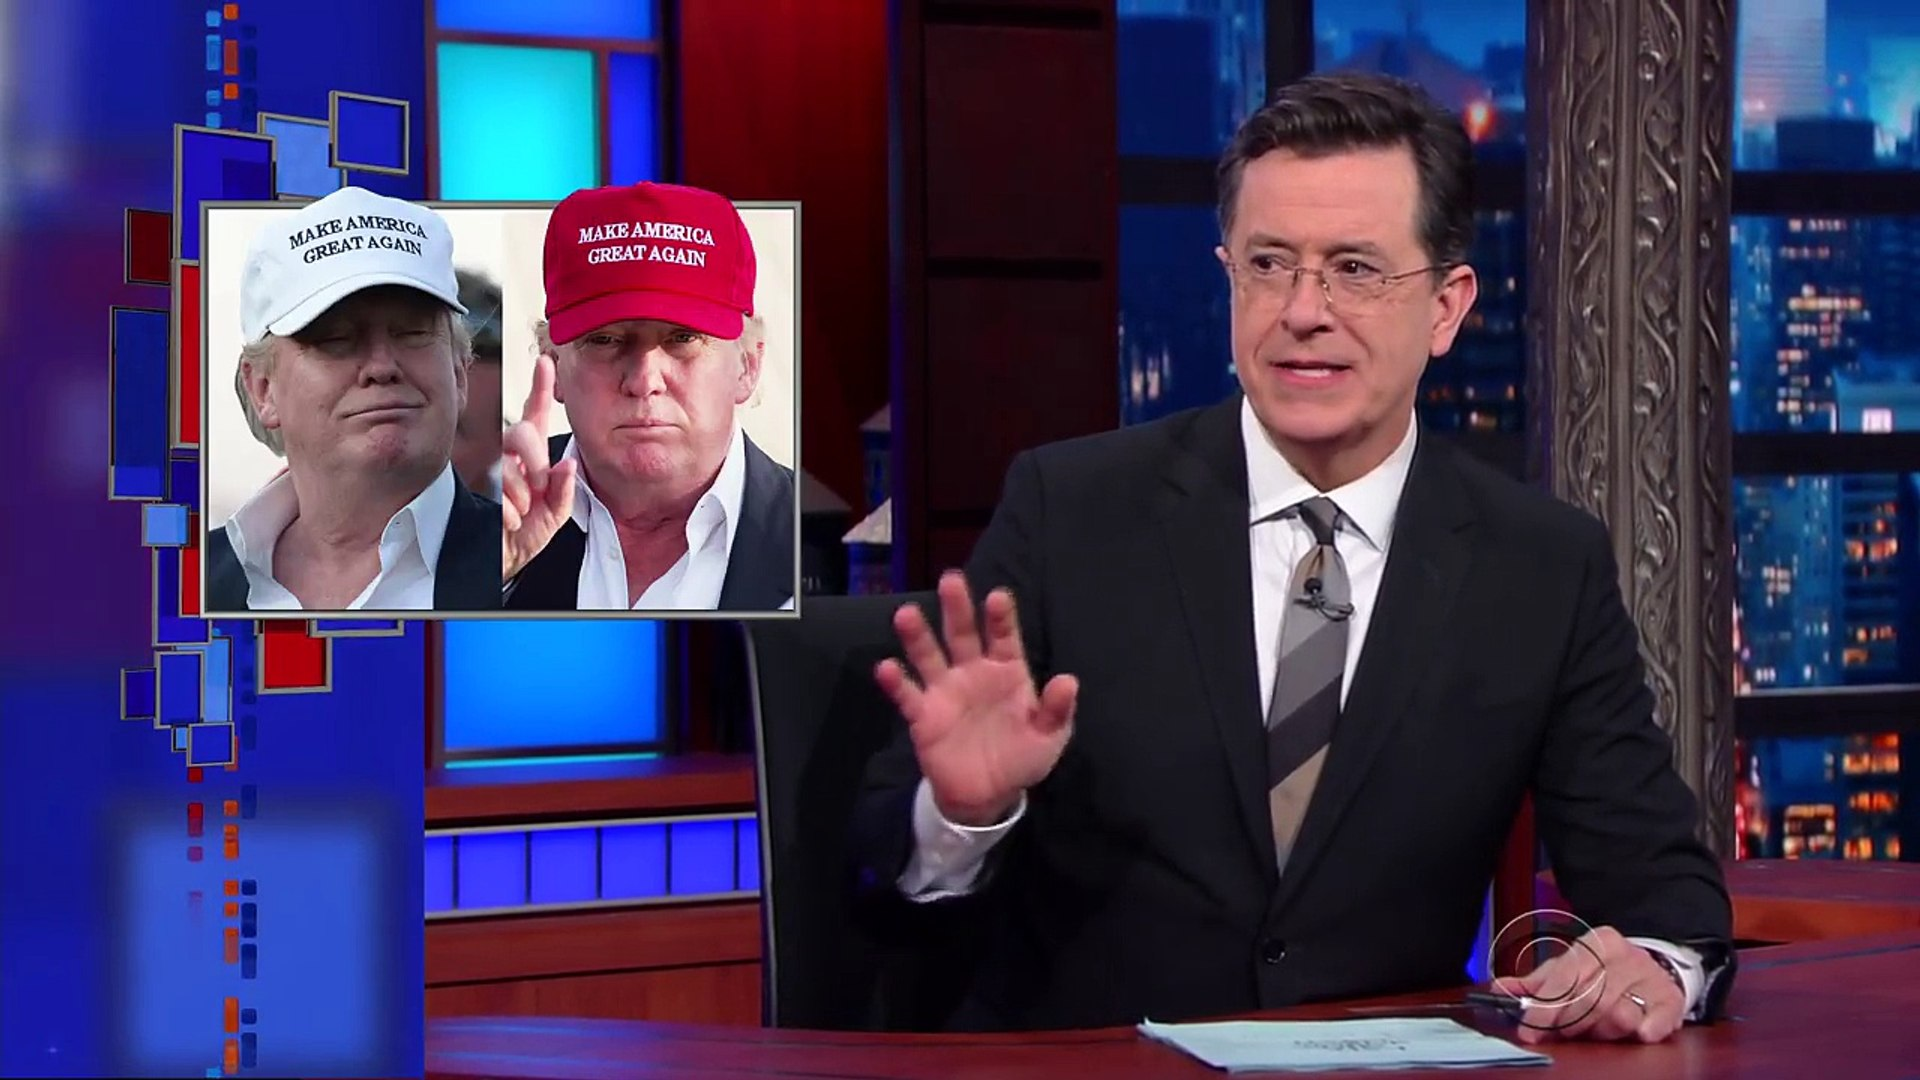 Cartoon Donald Trump Tells Stephen Who Started It-96Ivji-ph4A